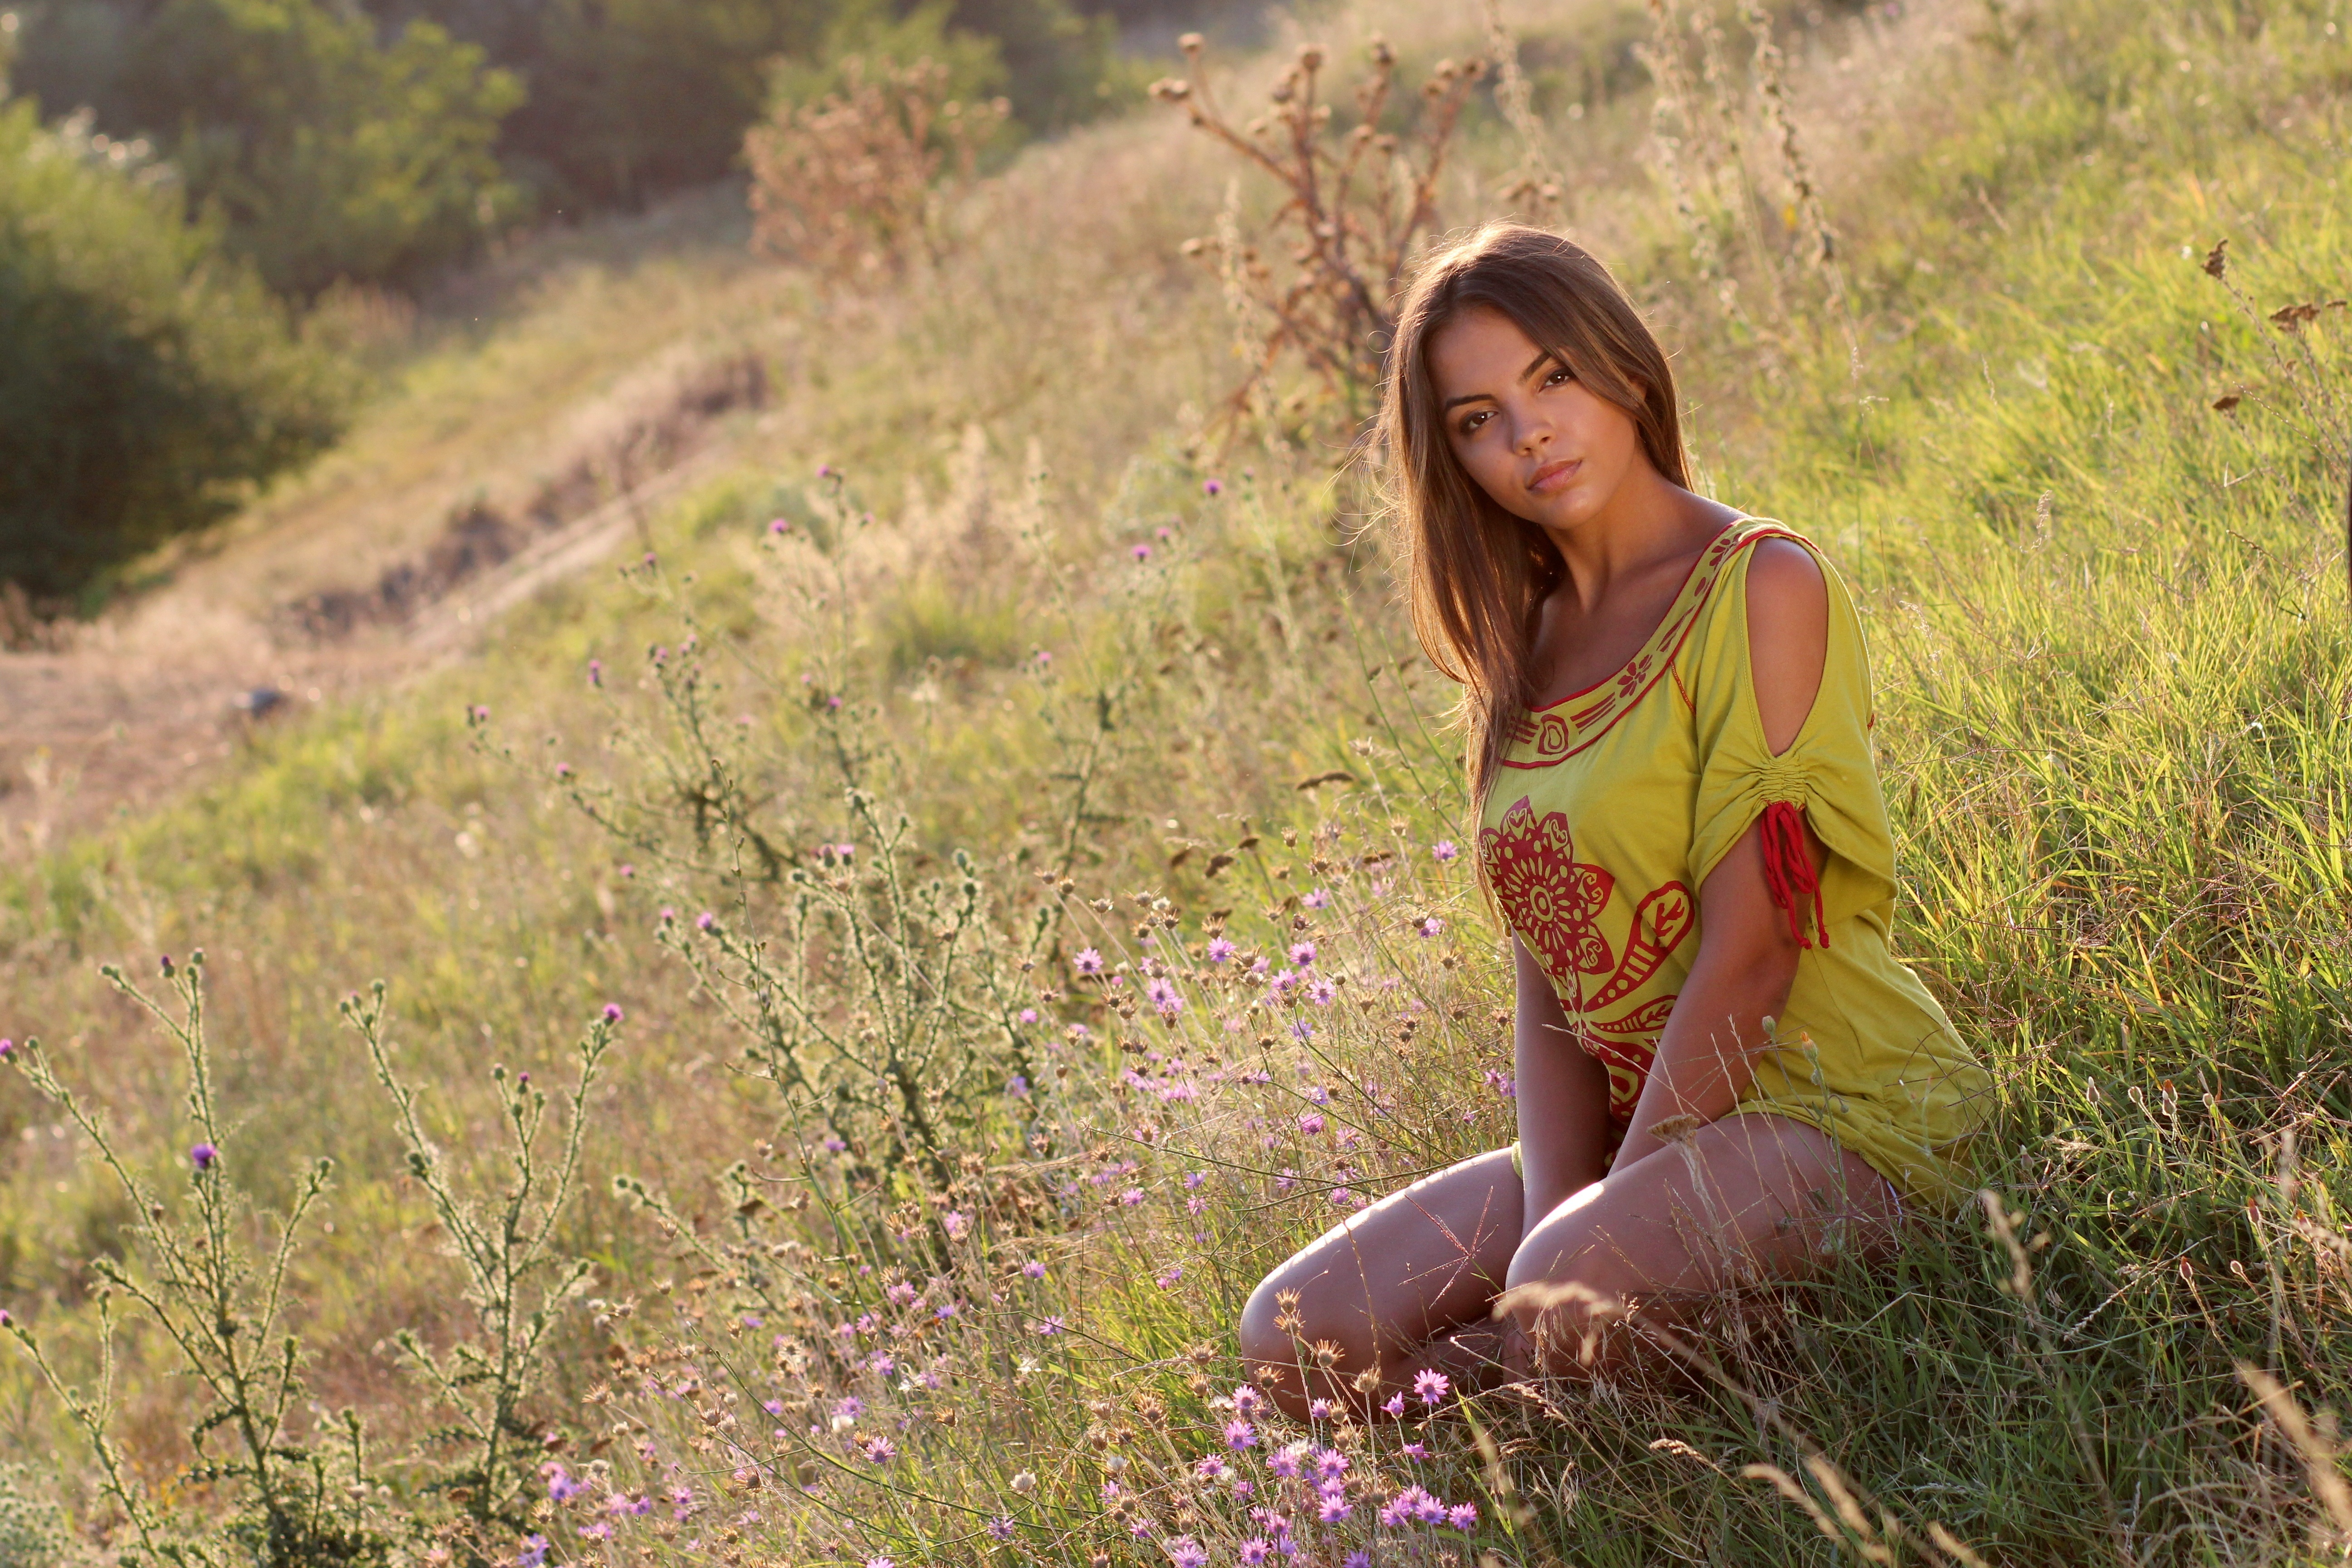 последнее деревенские девушки отдыхают на природе государство расположено